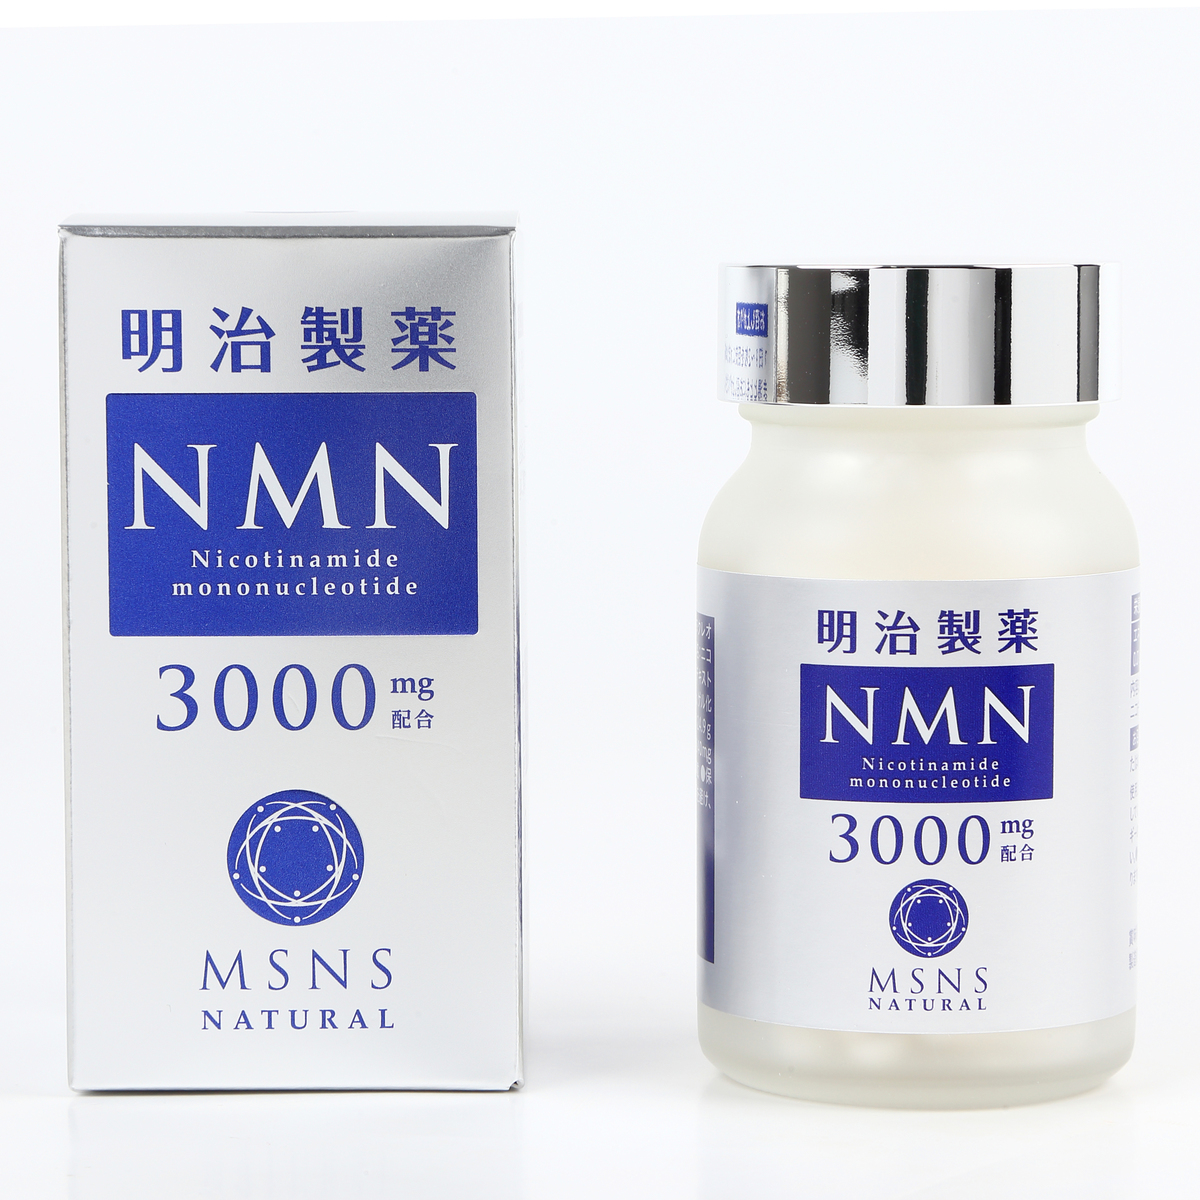 超定番 明治製薬 NMN 半額 3000mg 60粒 Natural